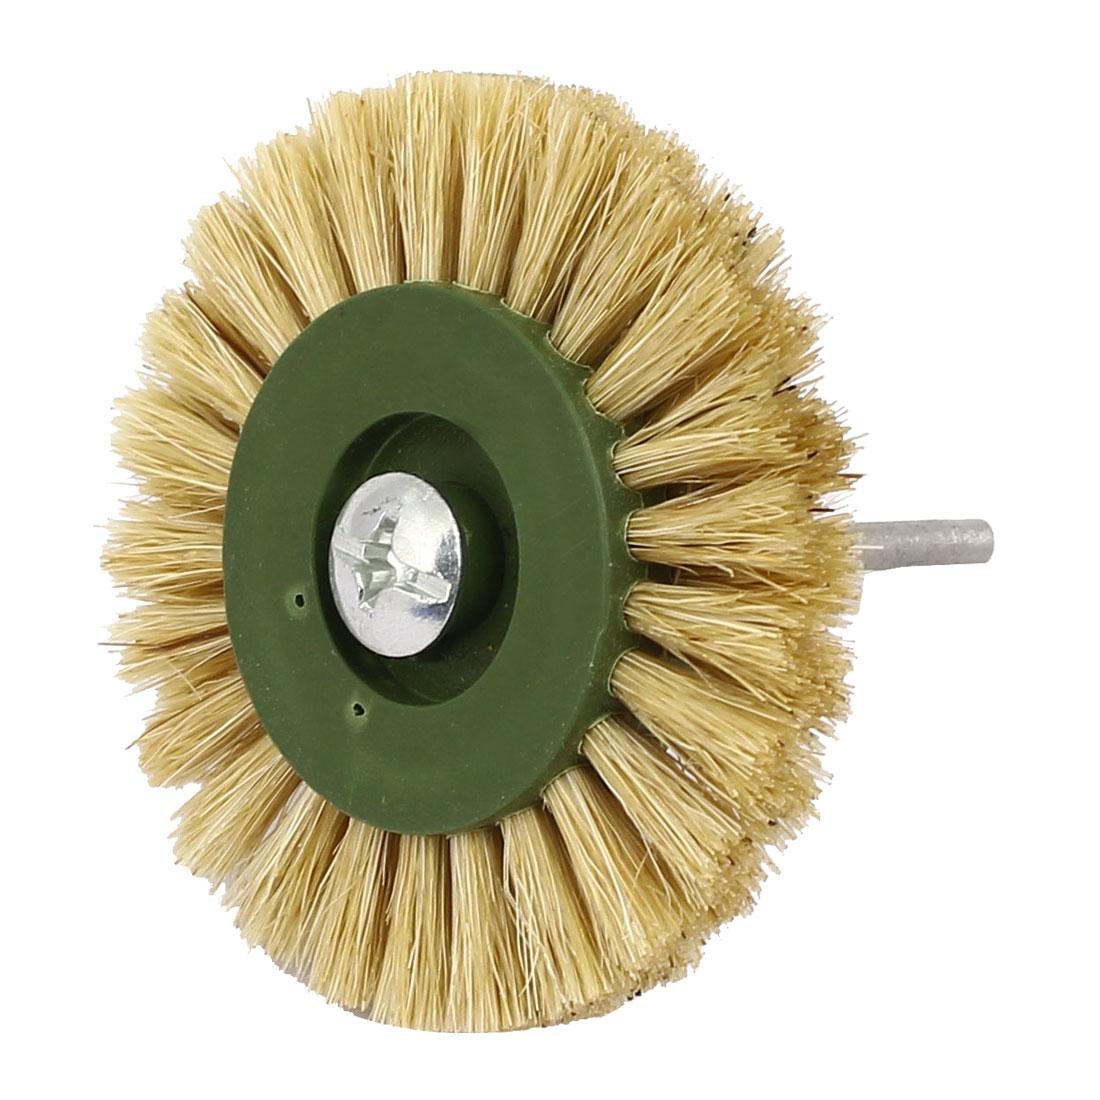 60mm Dia Head 3mm Shank Plastic Hub Bristle Wheel Brush Jewelry Polishing Tool